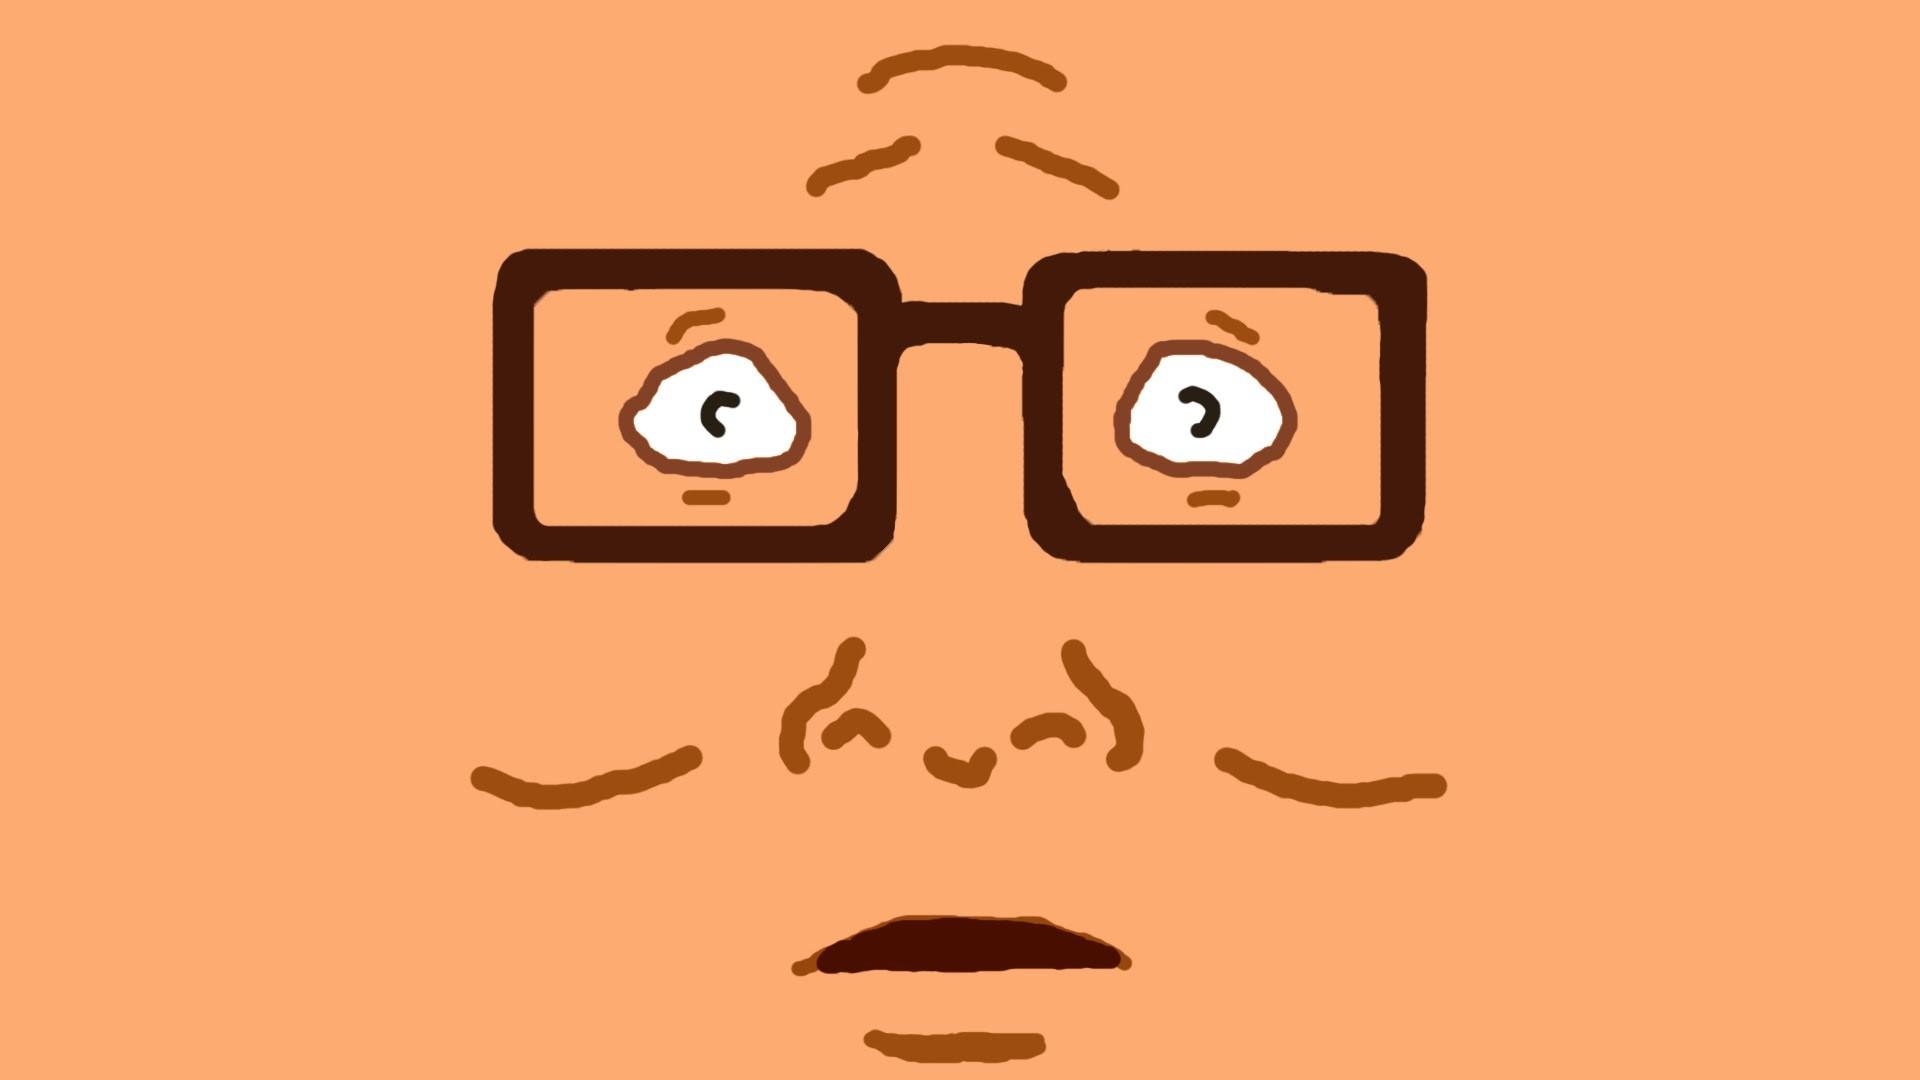 Hank Hill Plays Team Fortress 2